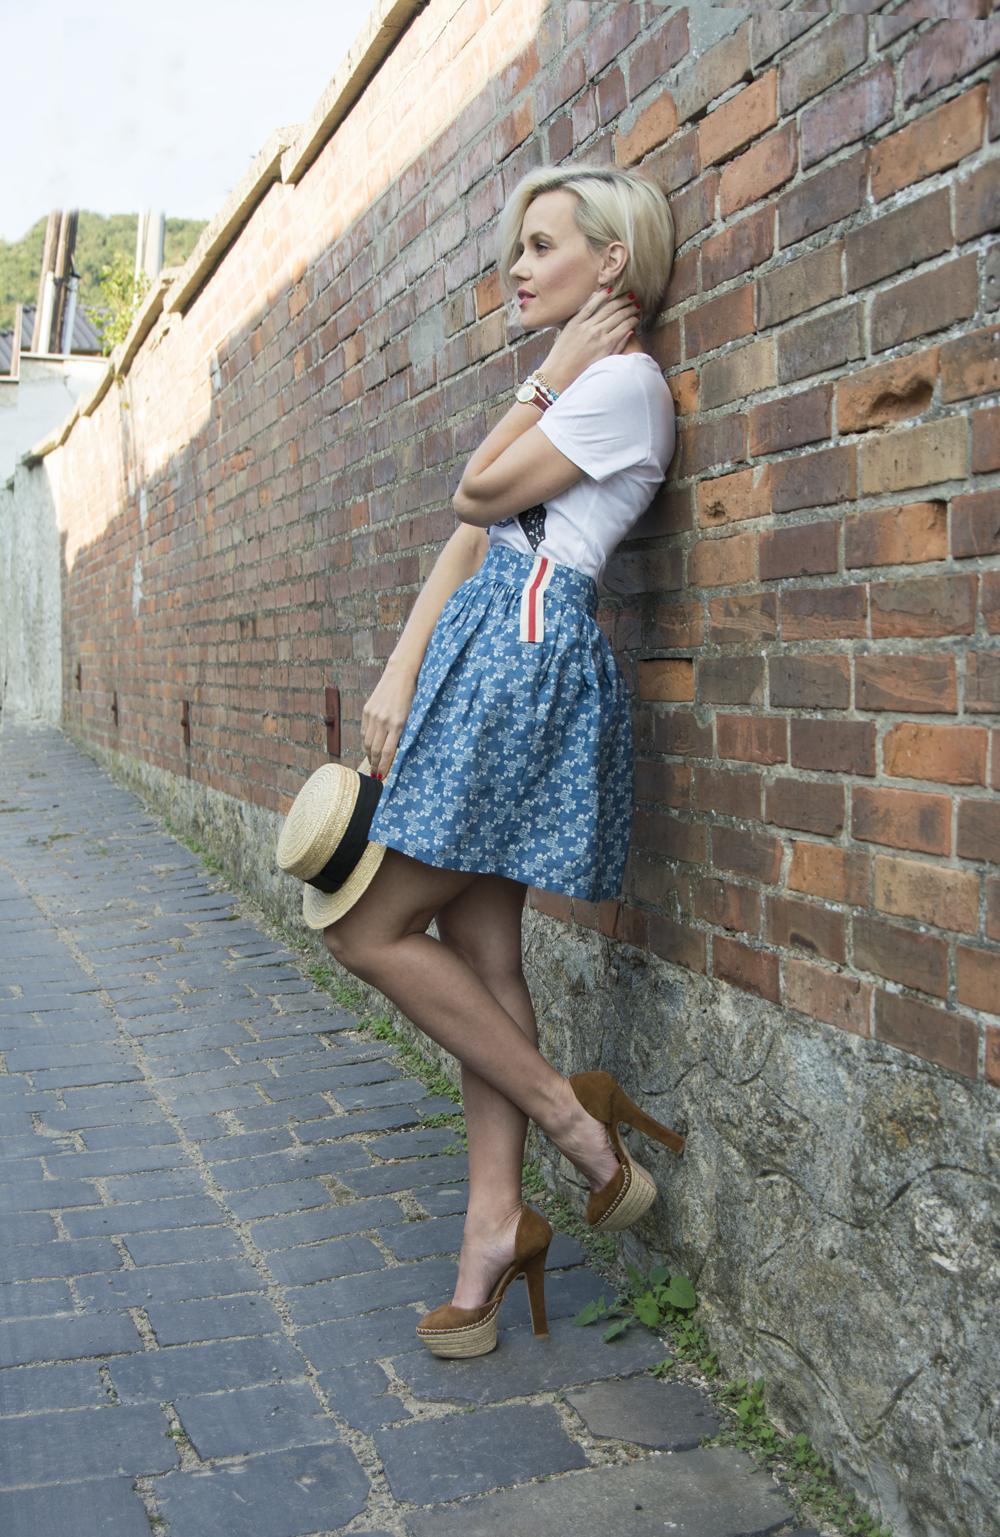 handmade-skirt-by-jana-tomas-janatini-6